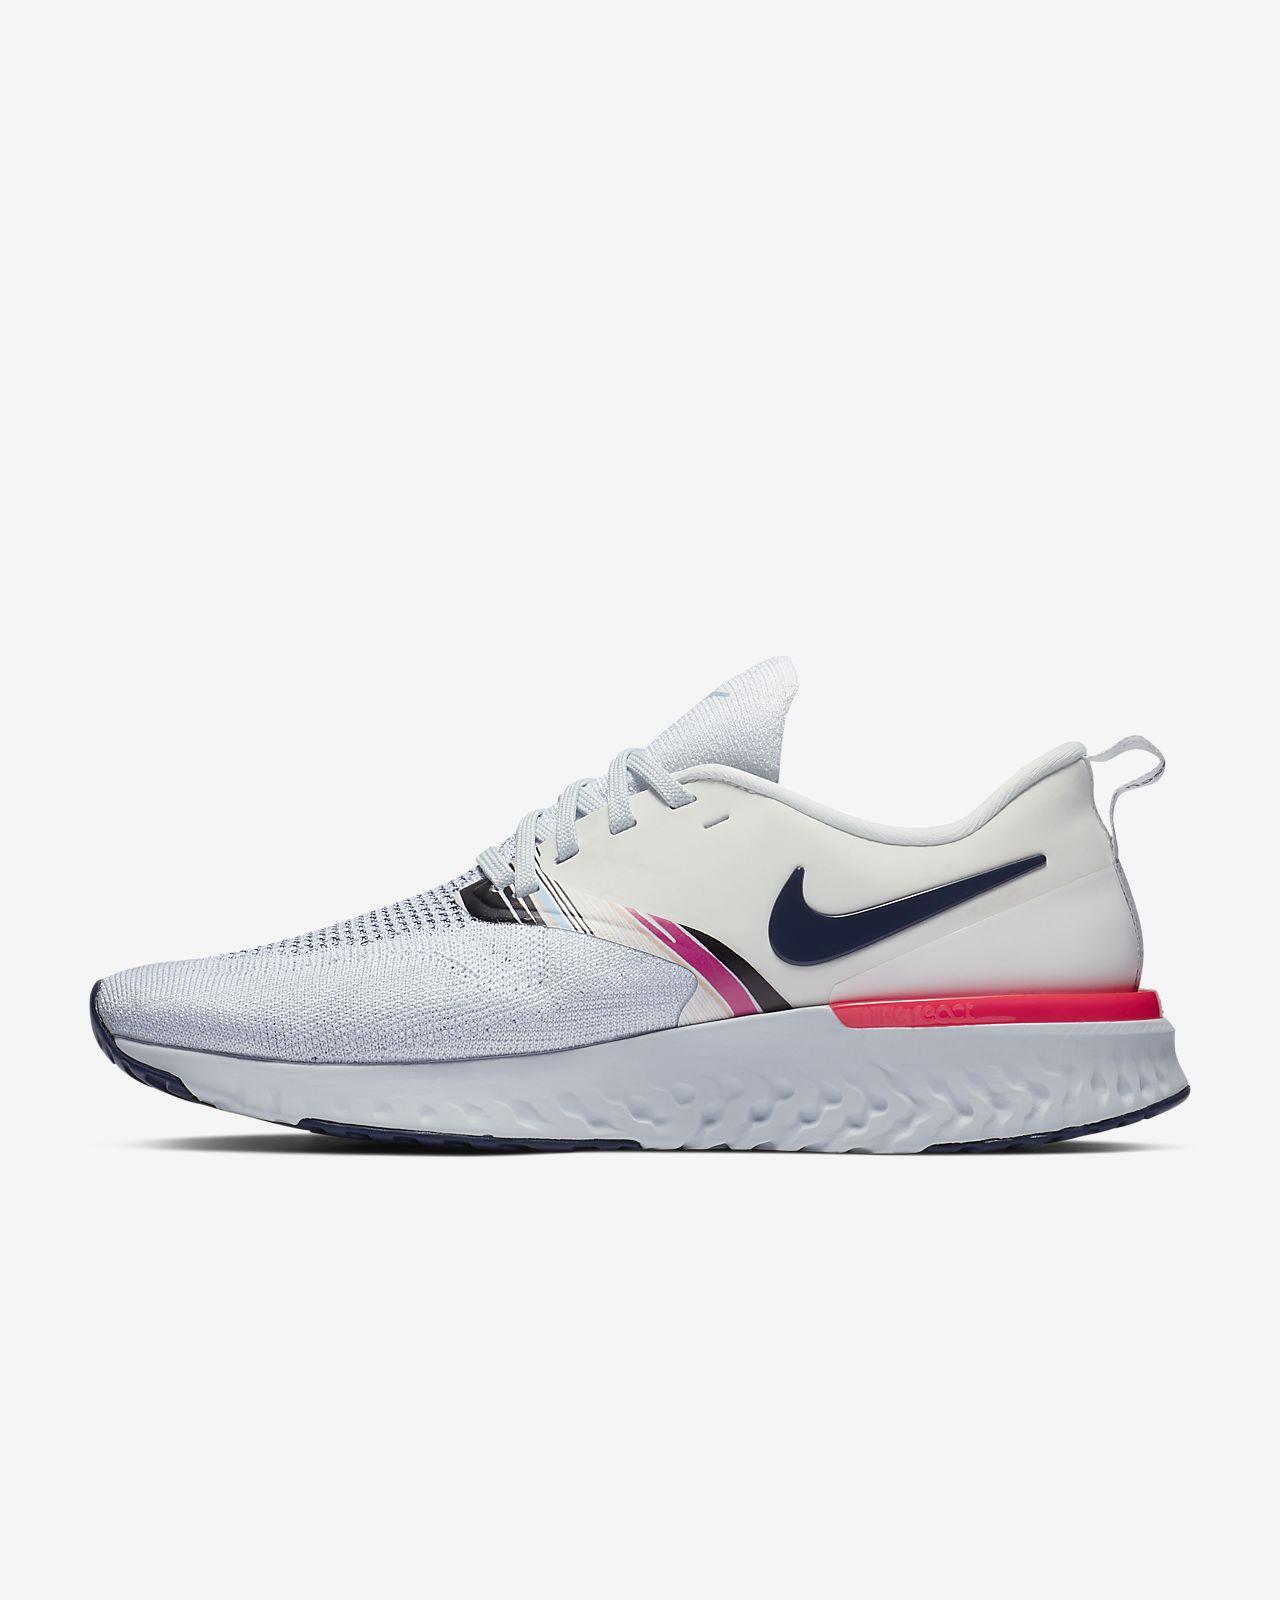 5c55434774d15c Nike Odyssey React Flyknit 2 Premium Women s Running Shoe. Nike.com GB